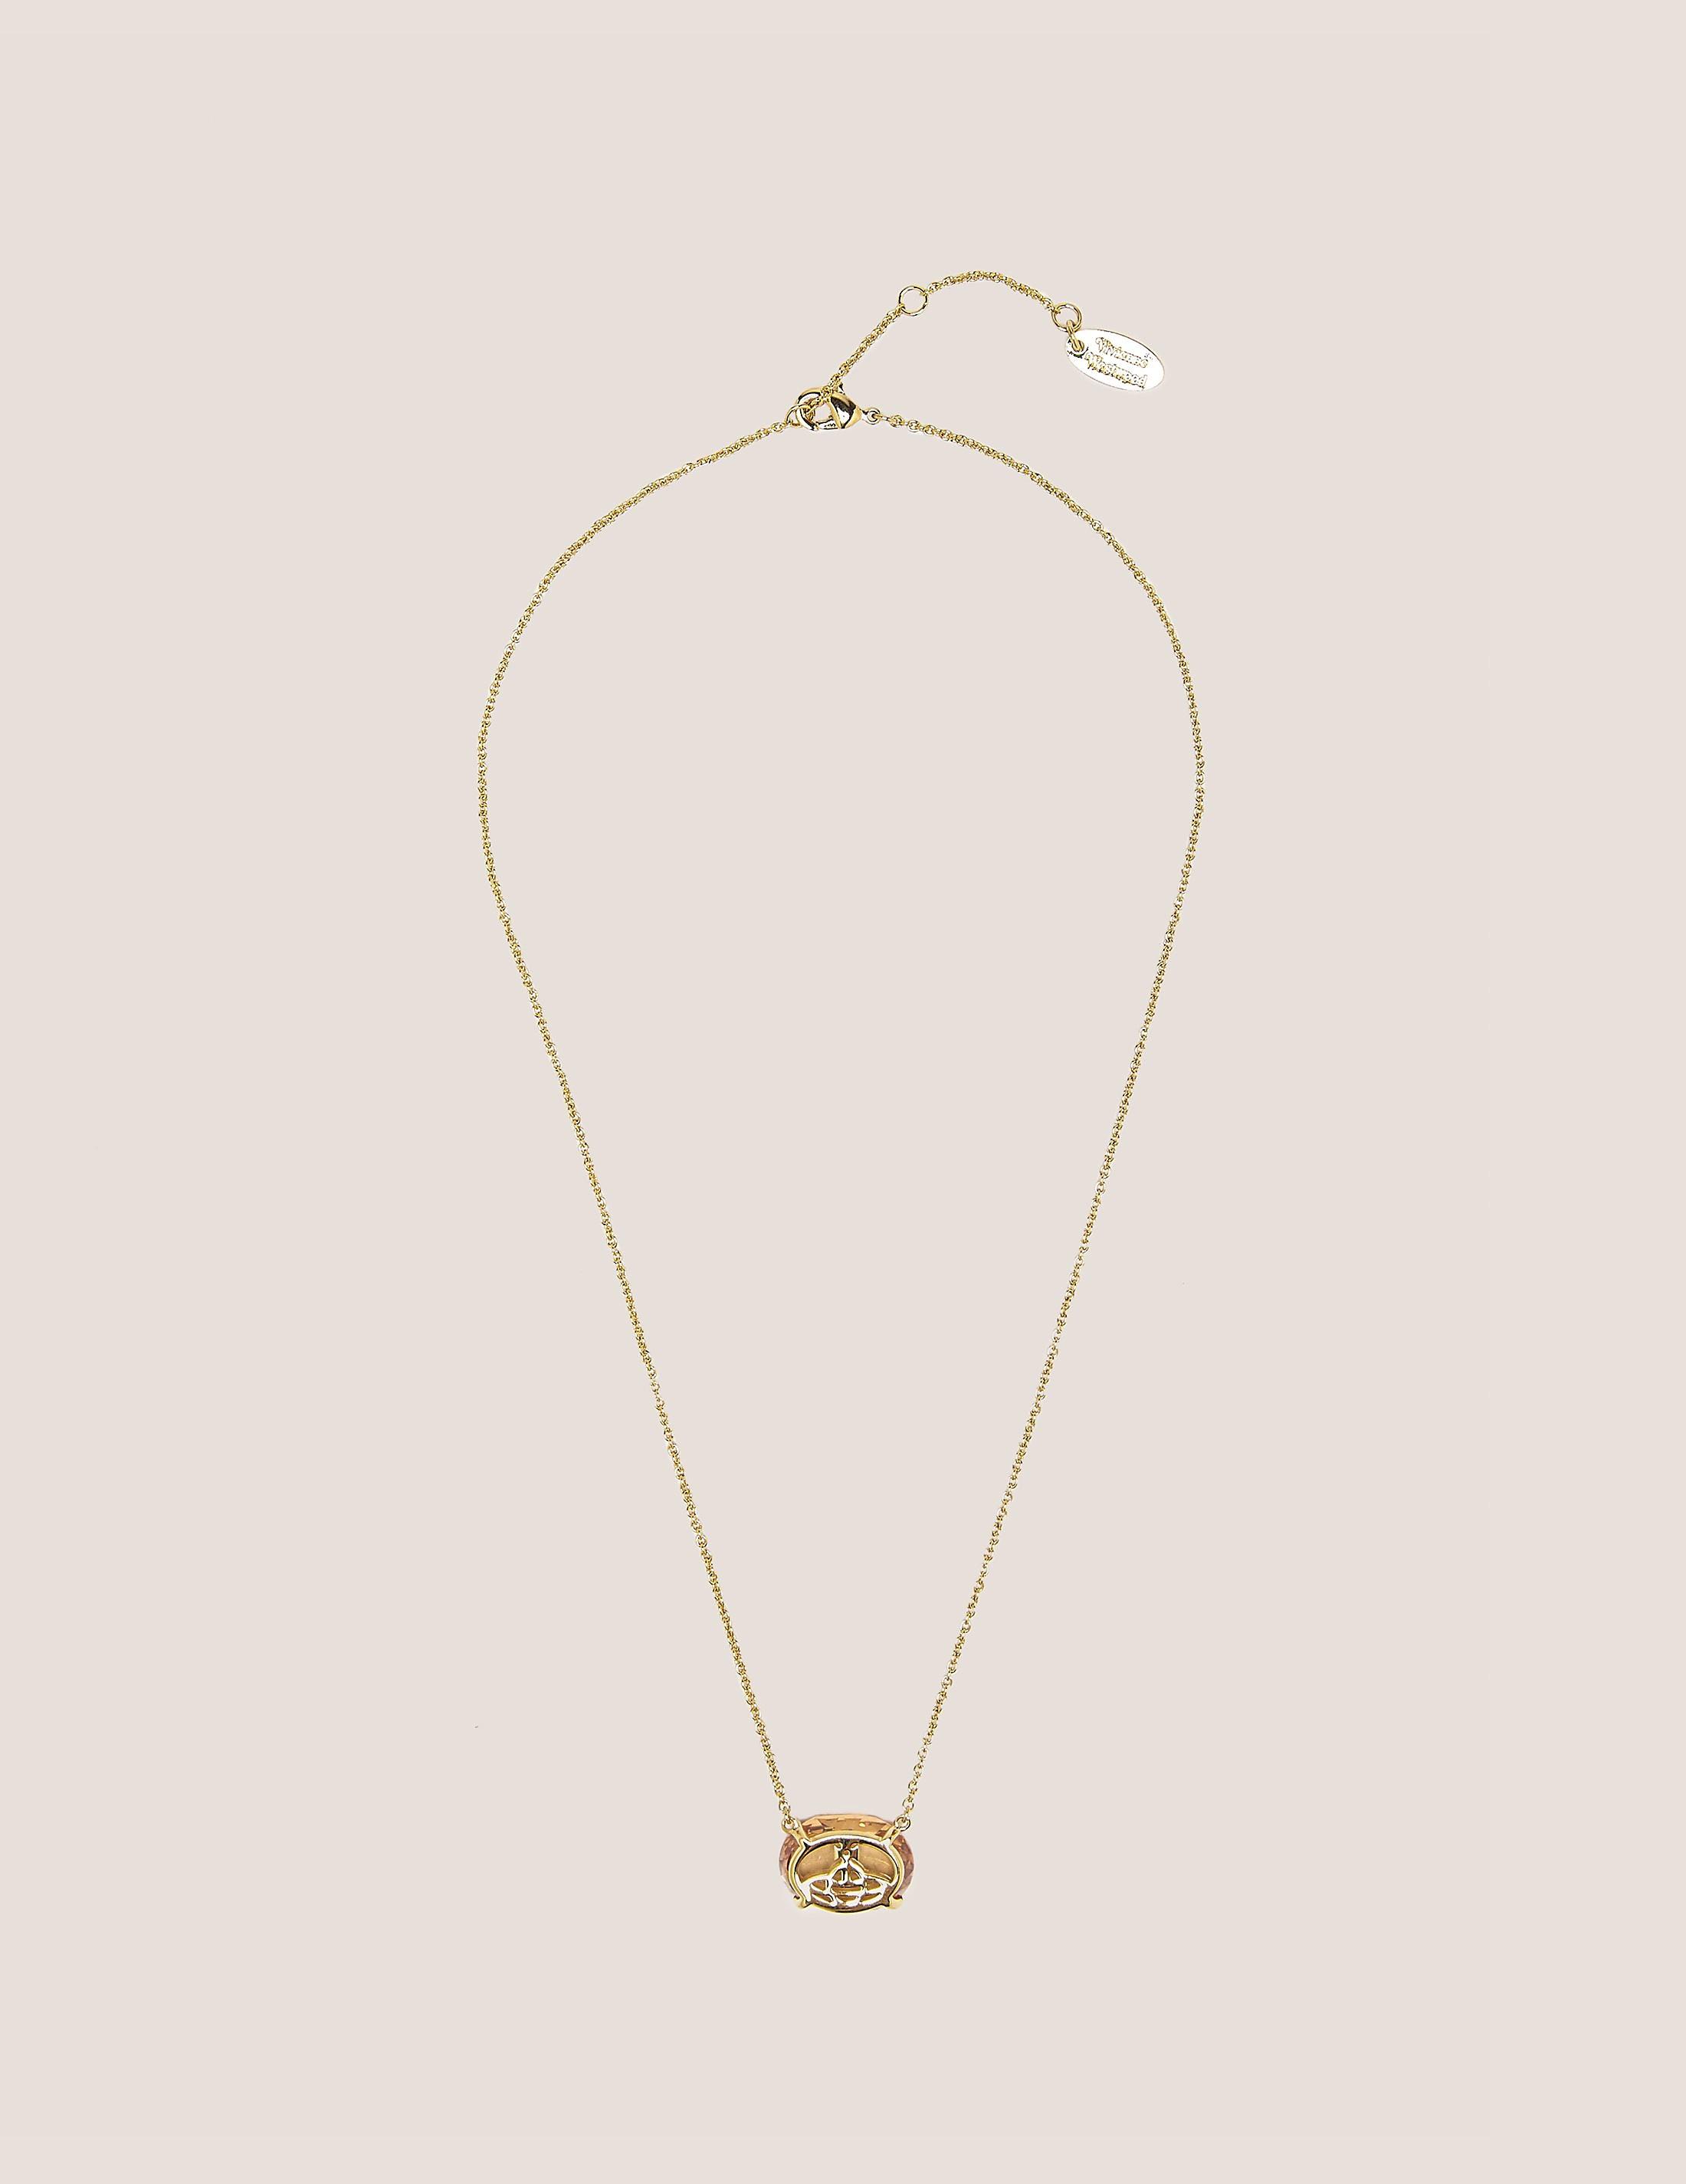 Vivienne Westwood Roseta Orb Pendant Necklace